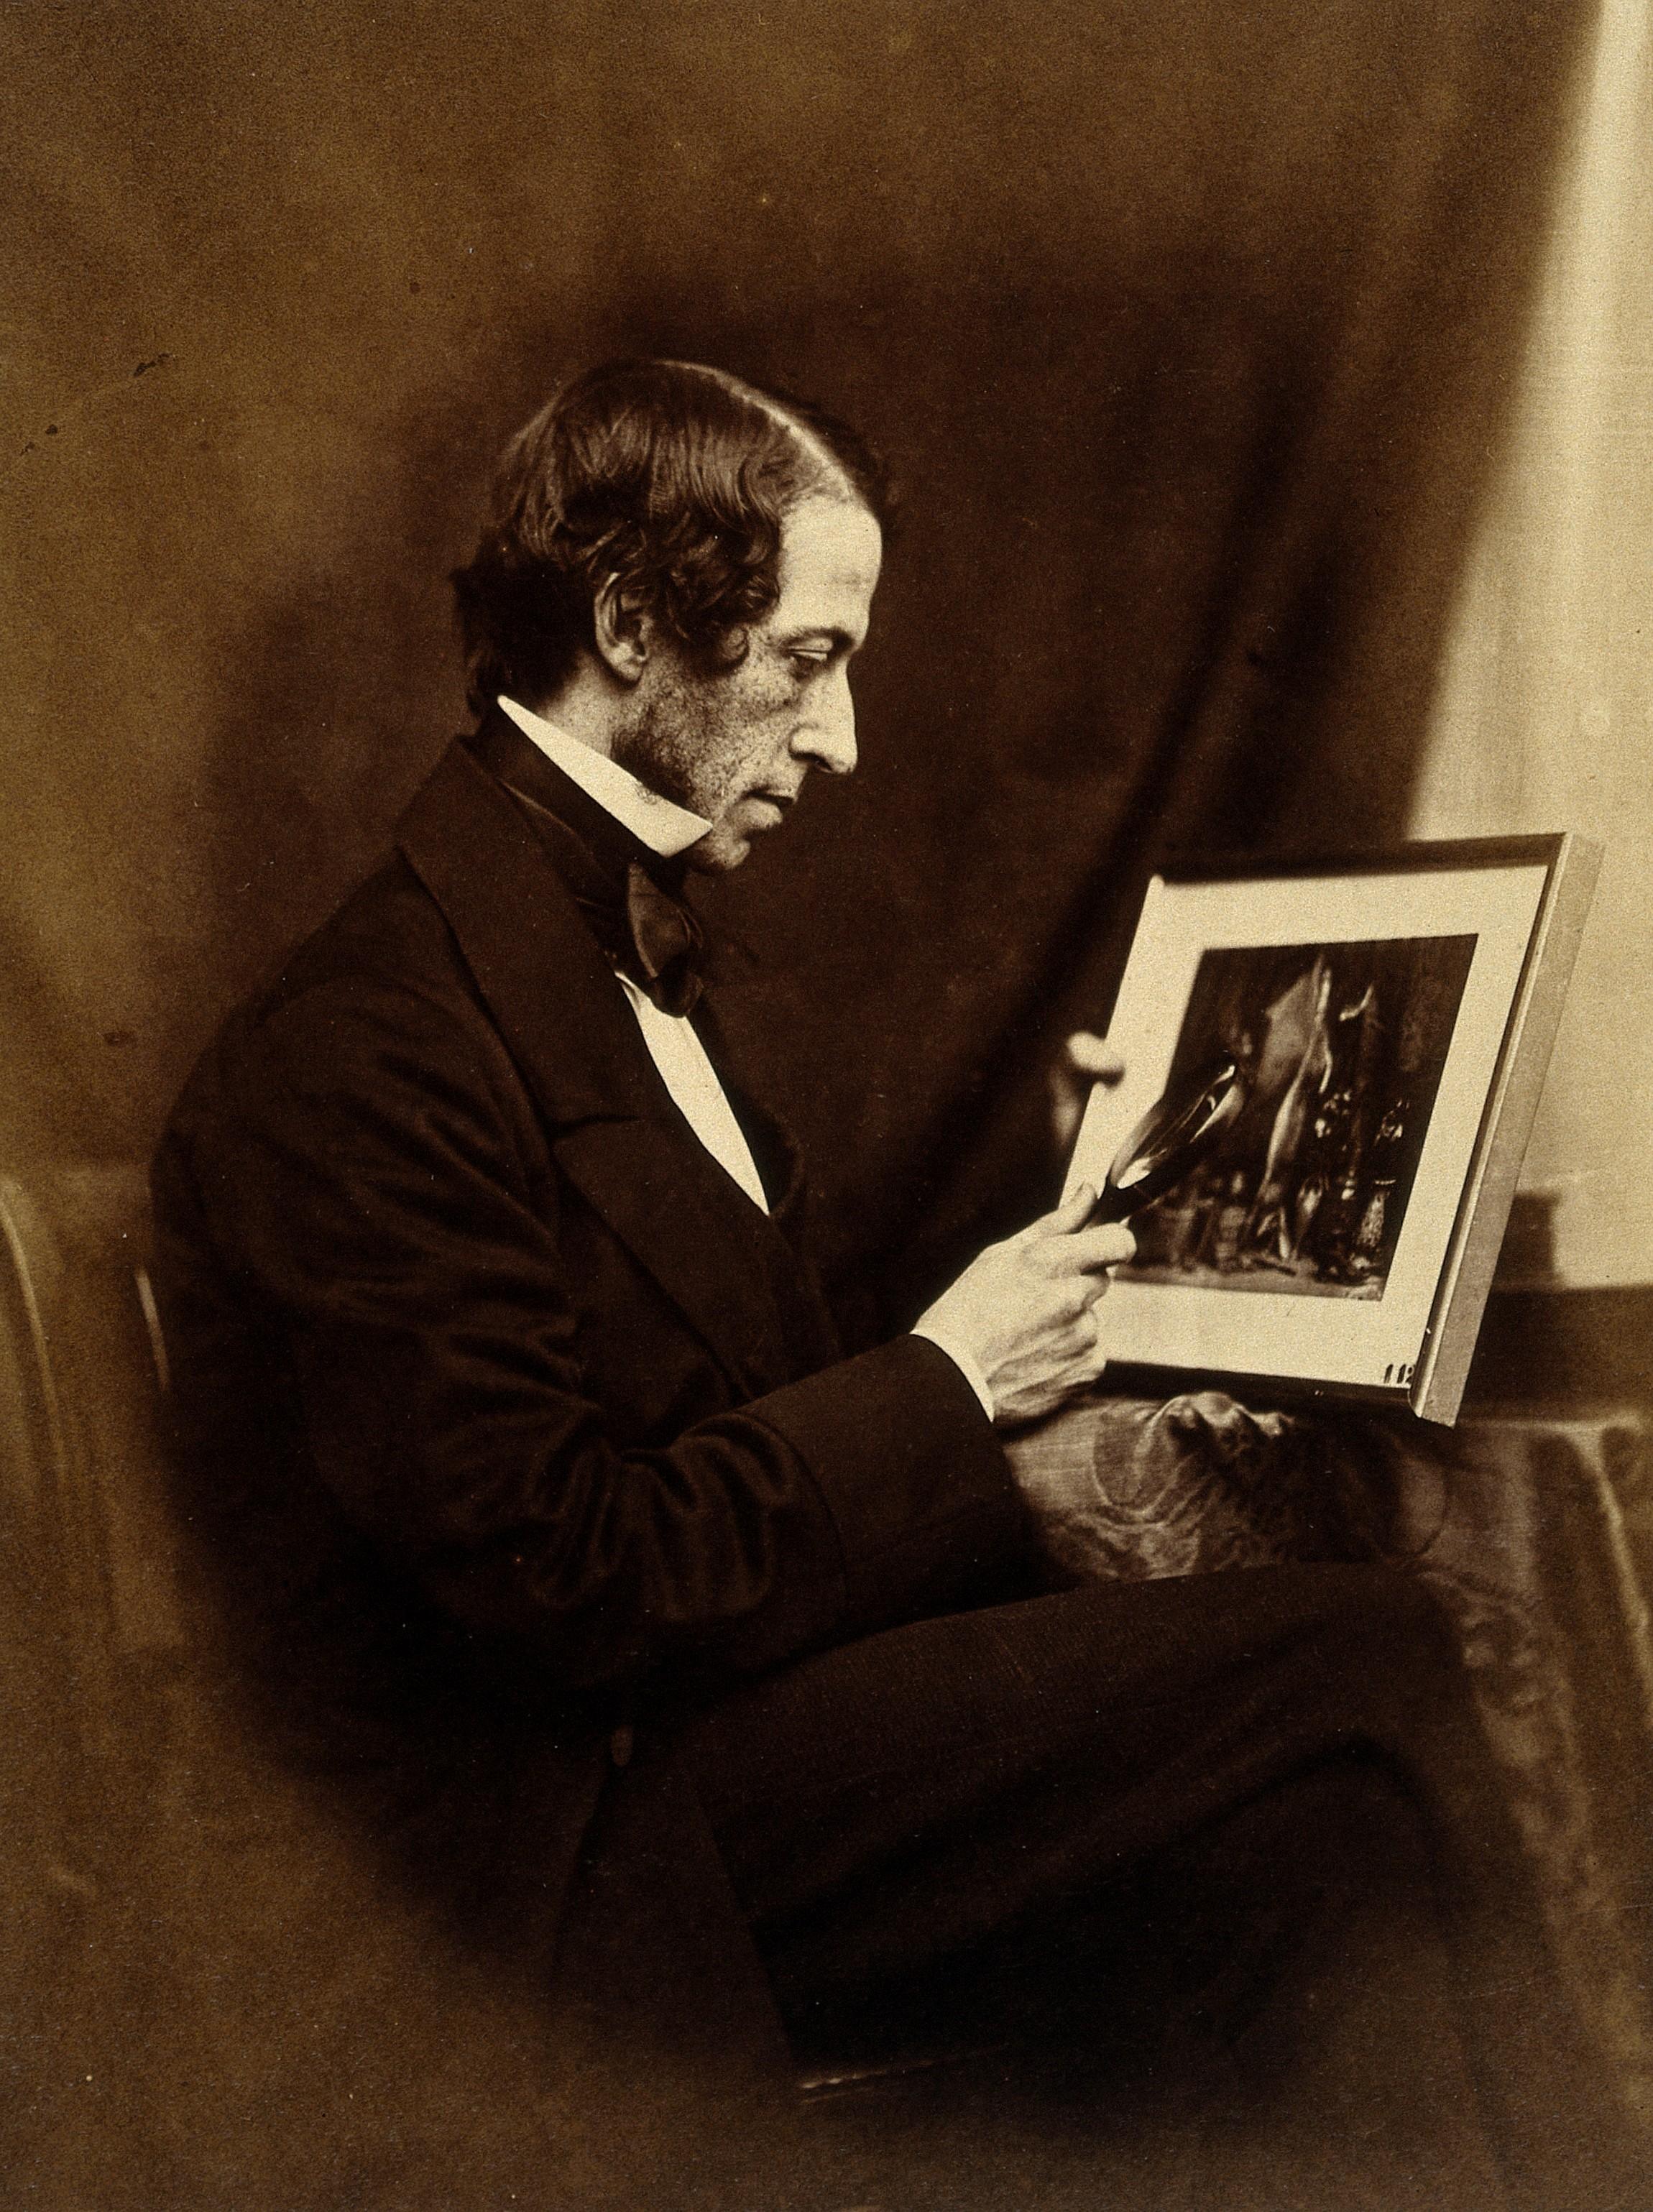 Image of Philip Henry Delamotte from Wikidata